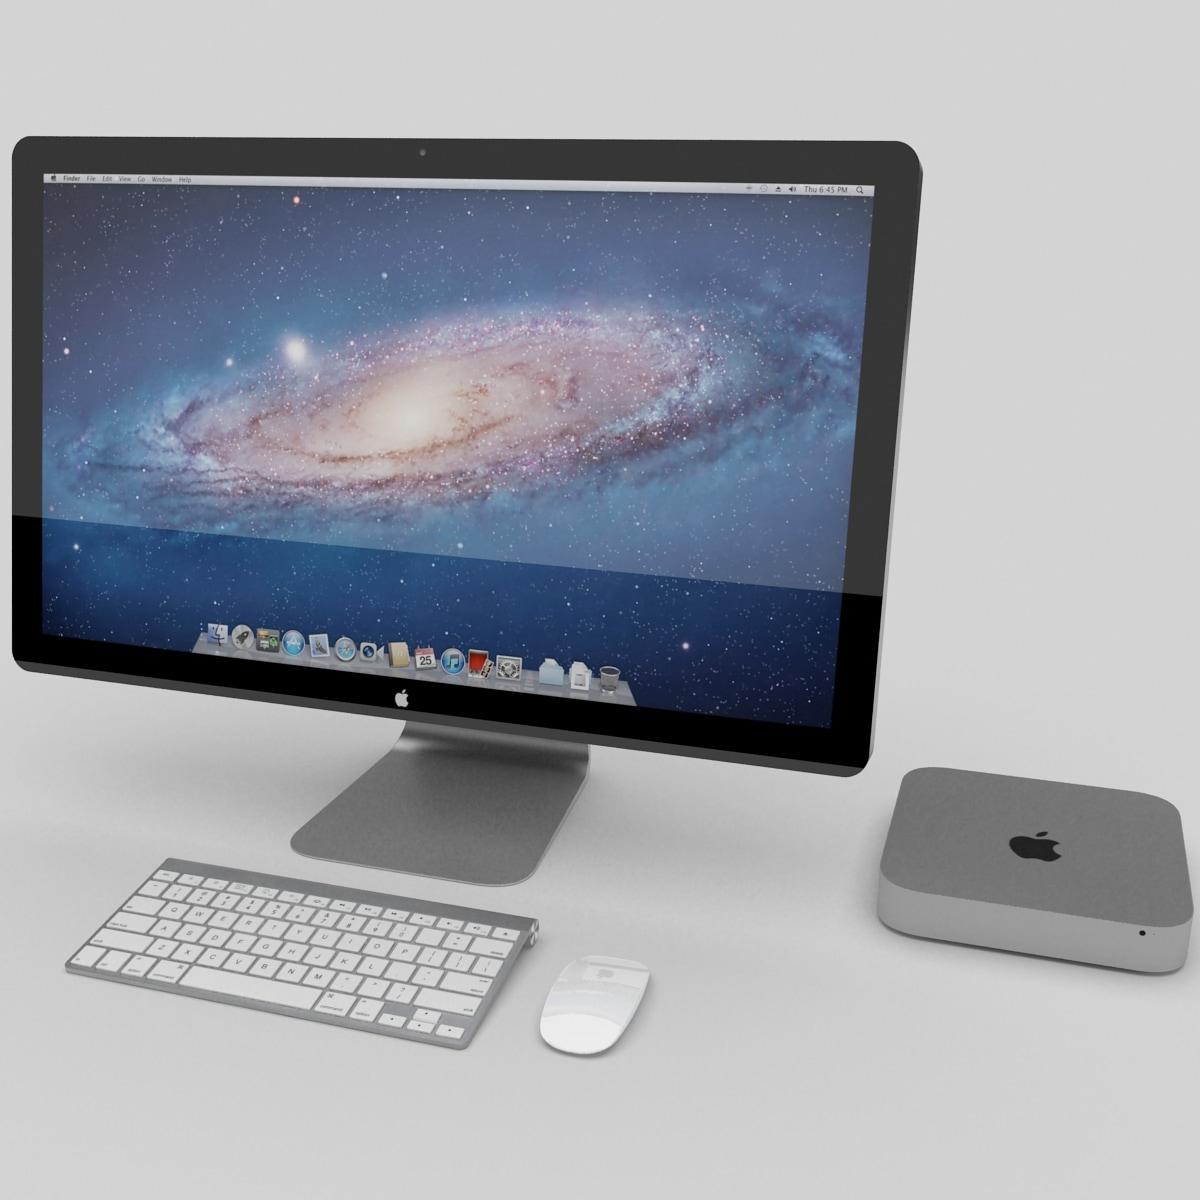 Apple_Mac_Mini_Collection_001.jpg